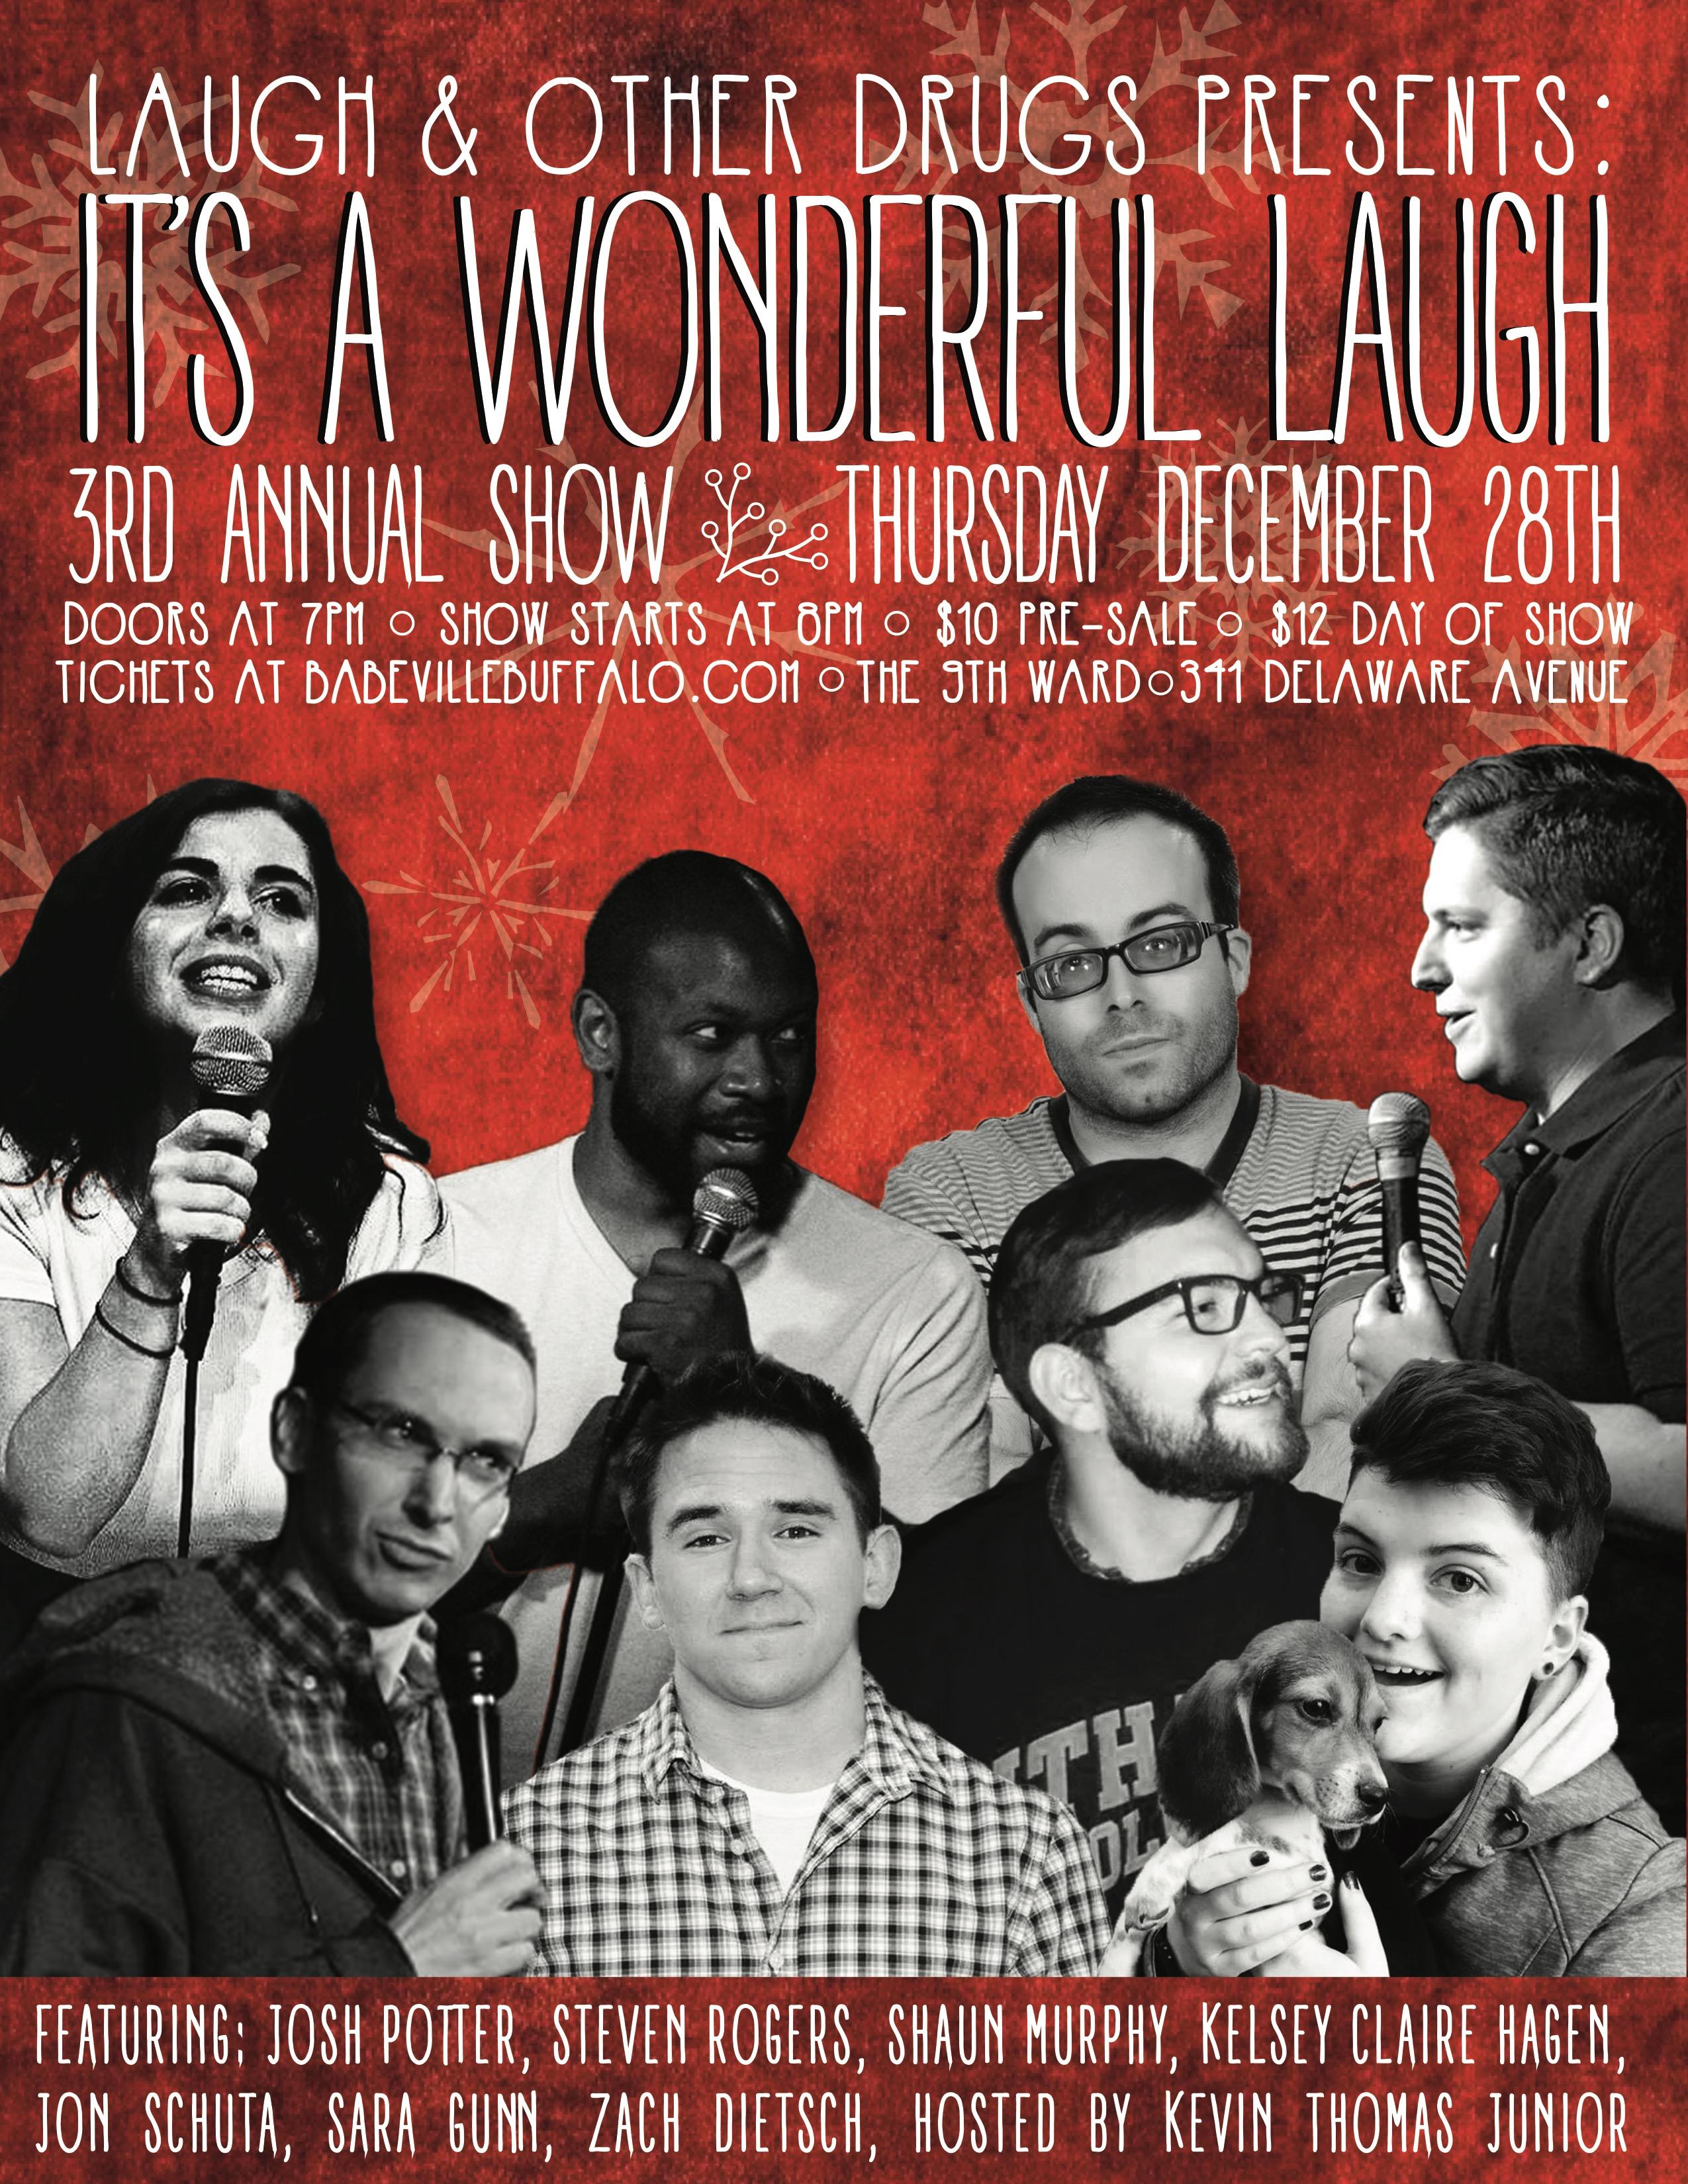 Laugh & Other Drugs: It's a Wonderful Laugh